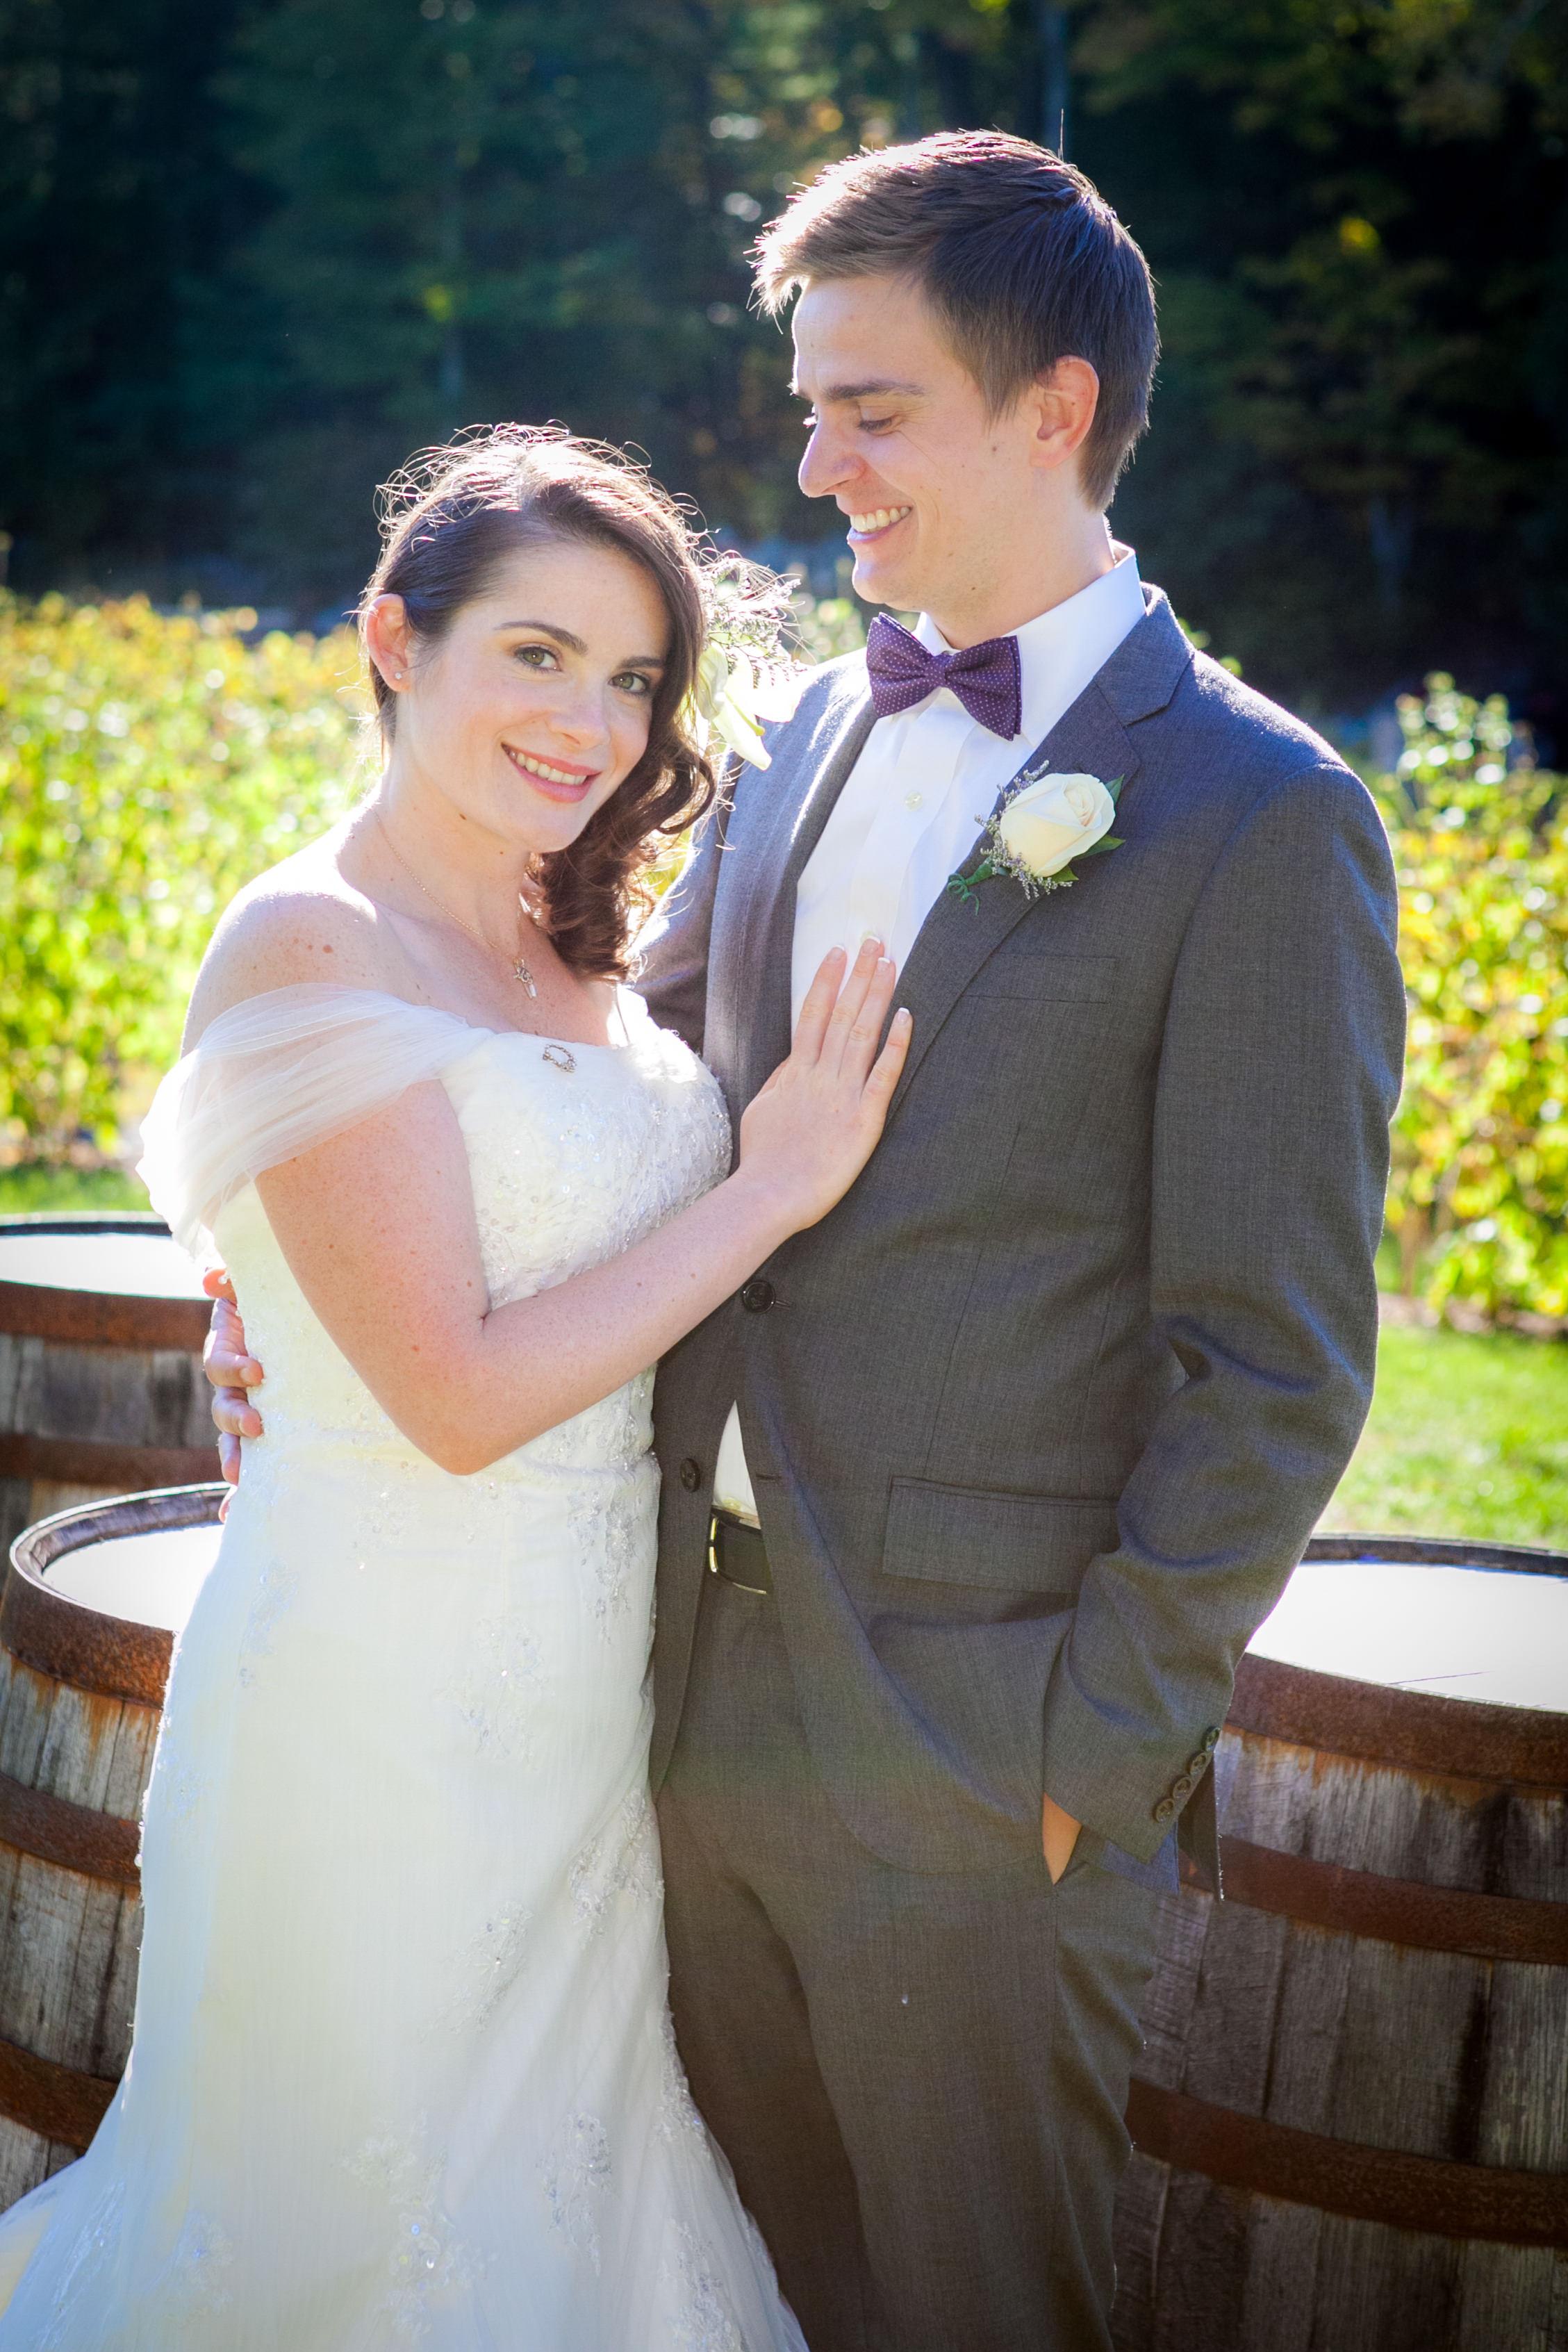 zorvino_sandown_NH_wedding_photography-32.jpg